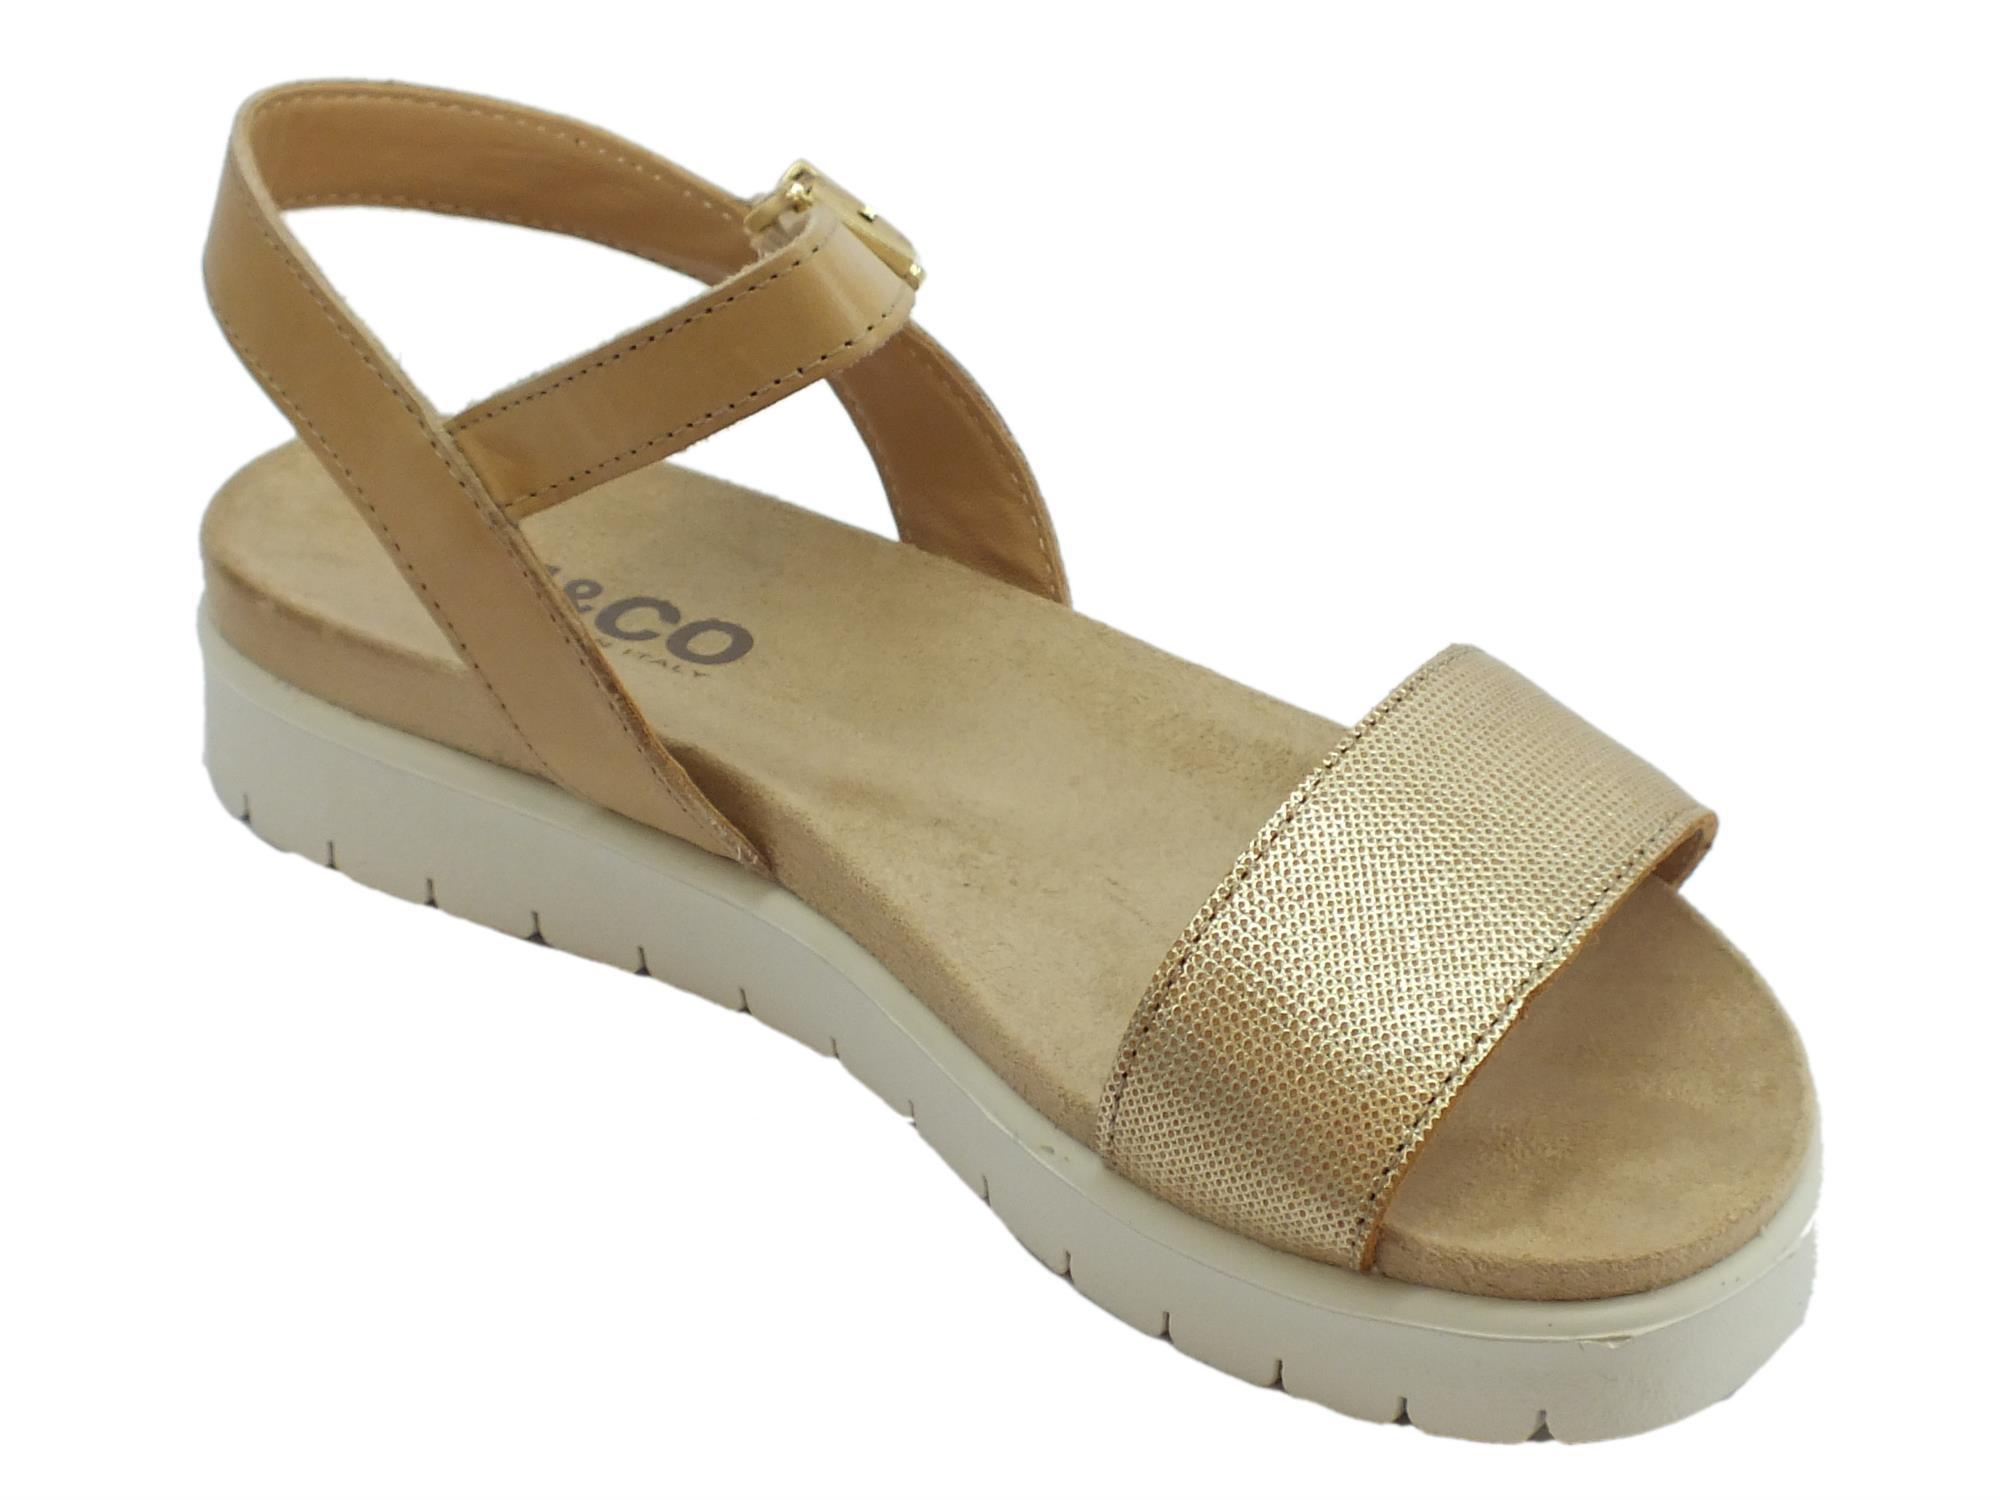 Sandali Igi&Co per donna in pelle beige zeppa bassa